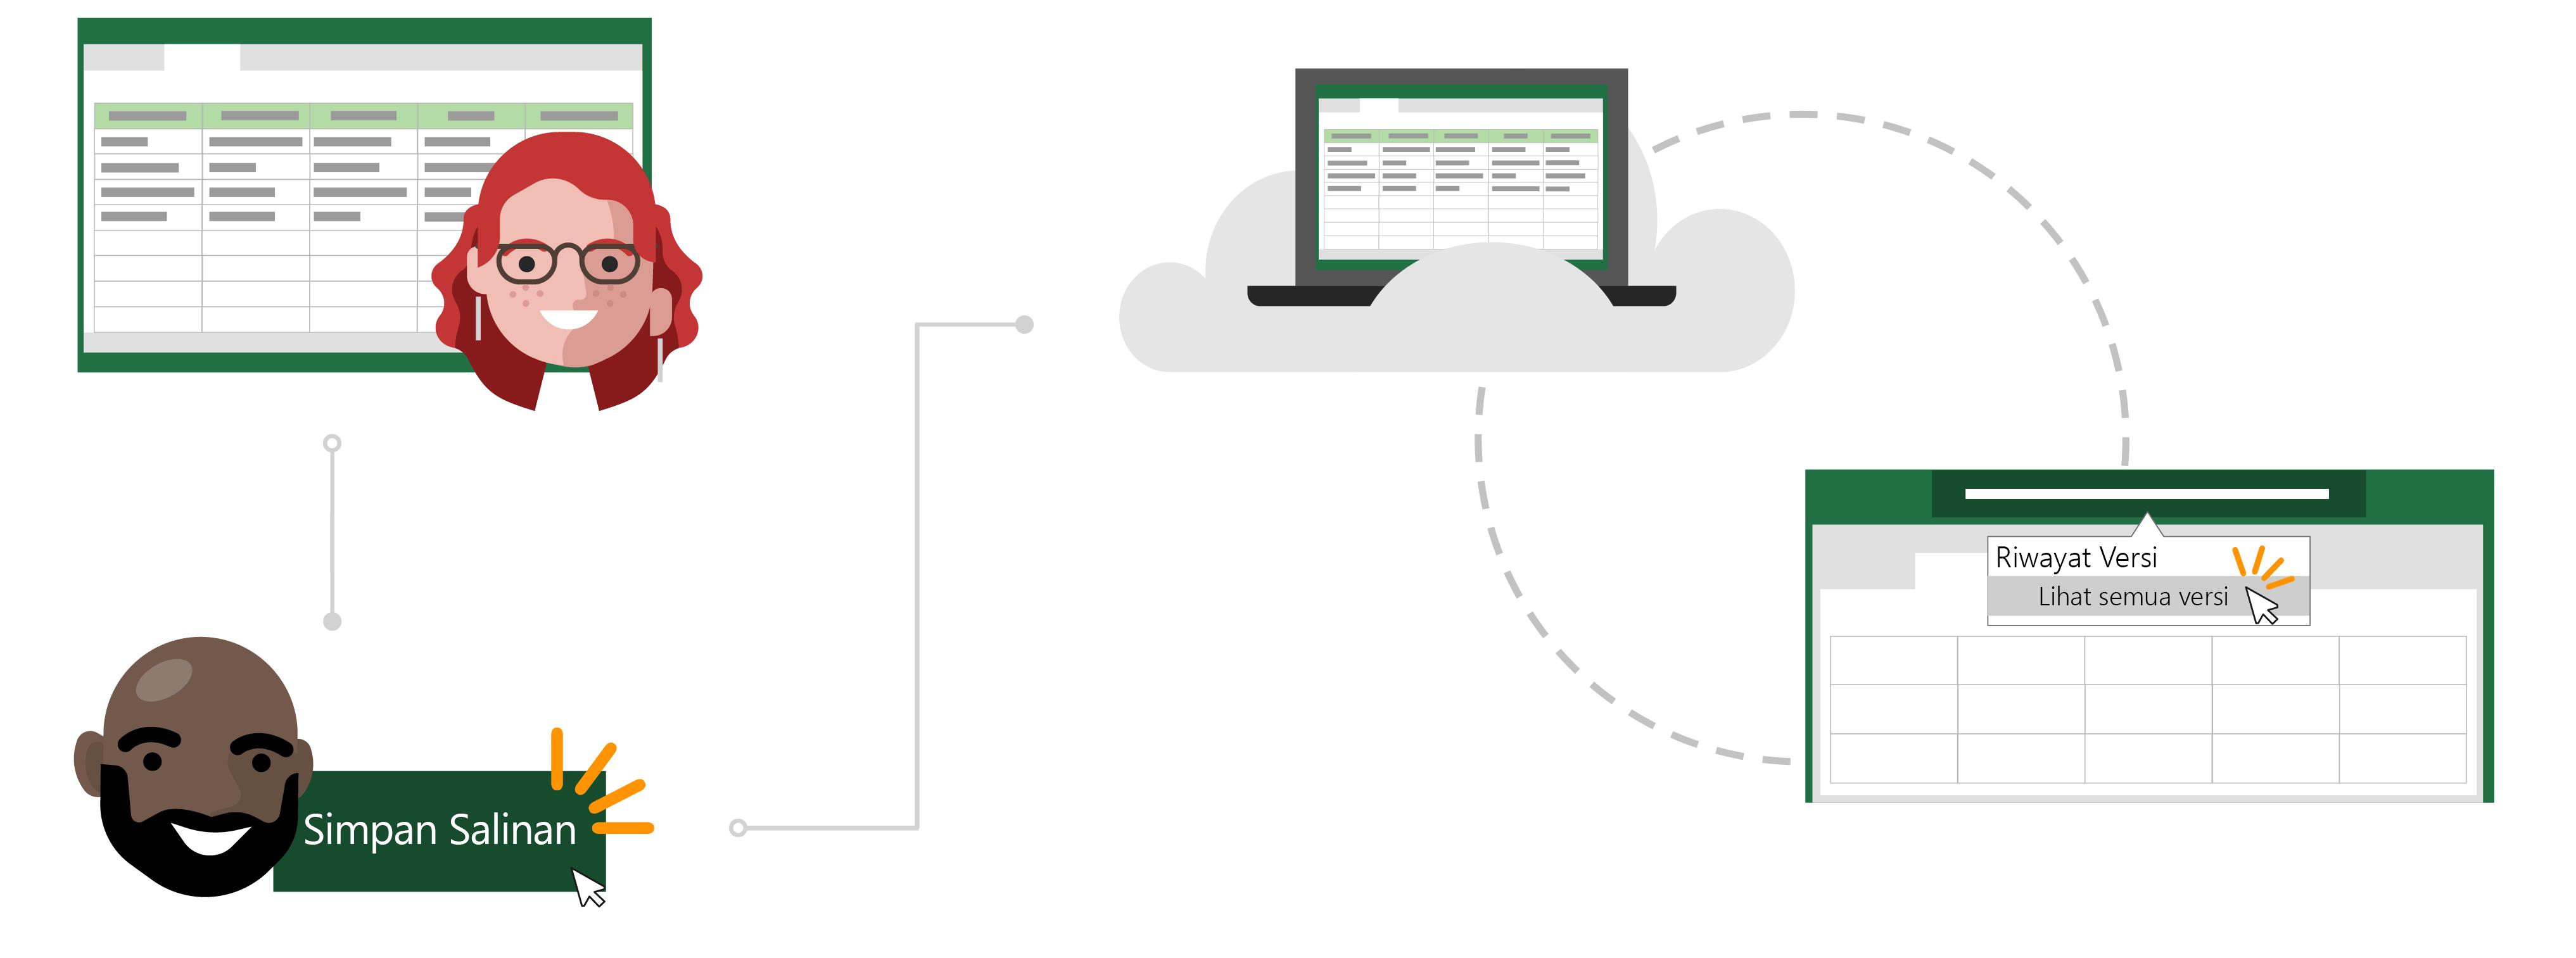 Menggunakan file yang ada di awan sebagai Templat untuk menggunakan menyimpan salinan file baru.